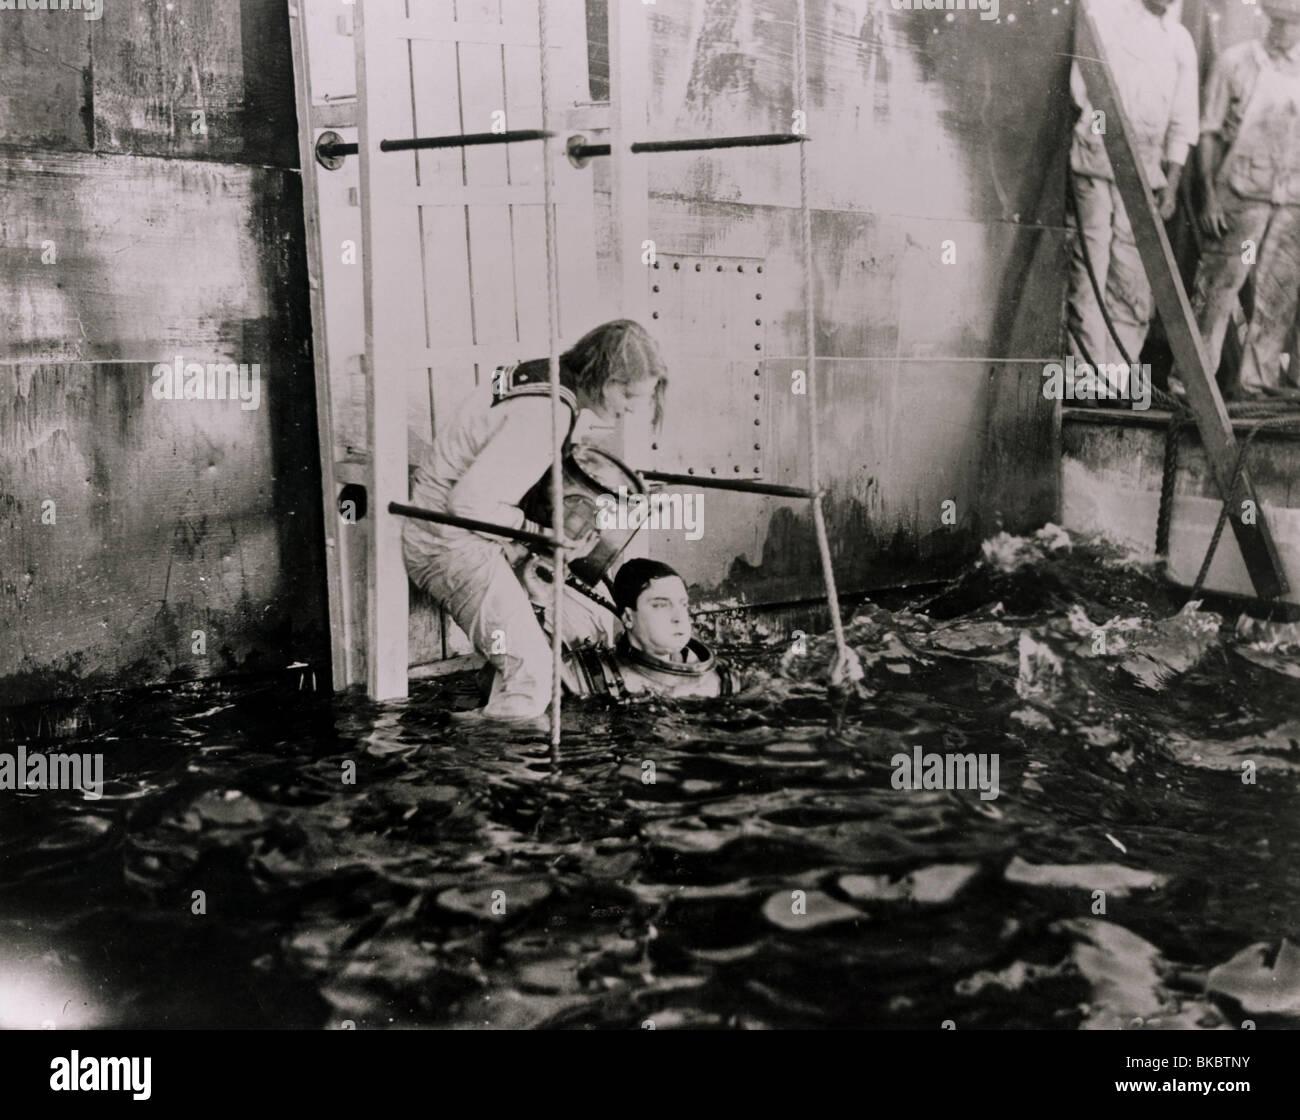 THE NAVIGATOR (1924) BUSTER KEATON NAVG 006P - Stock Image